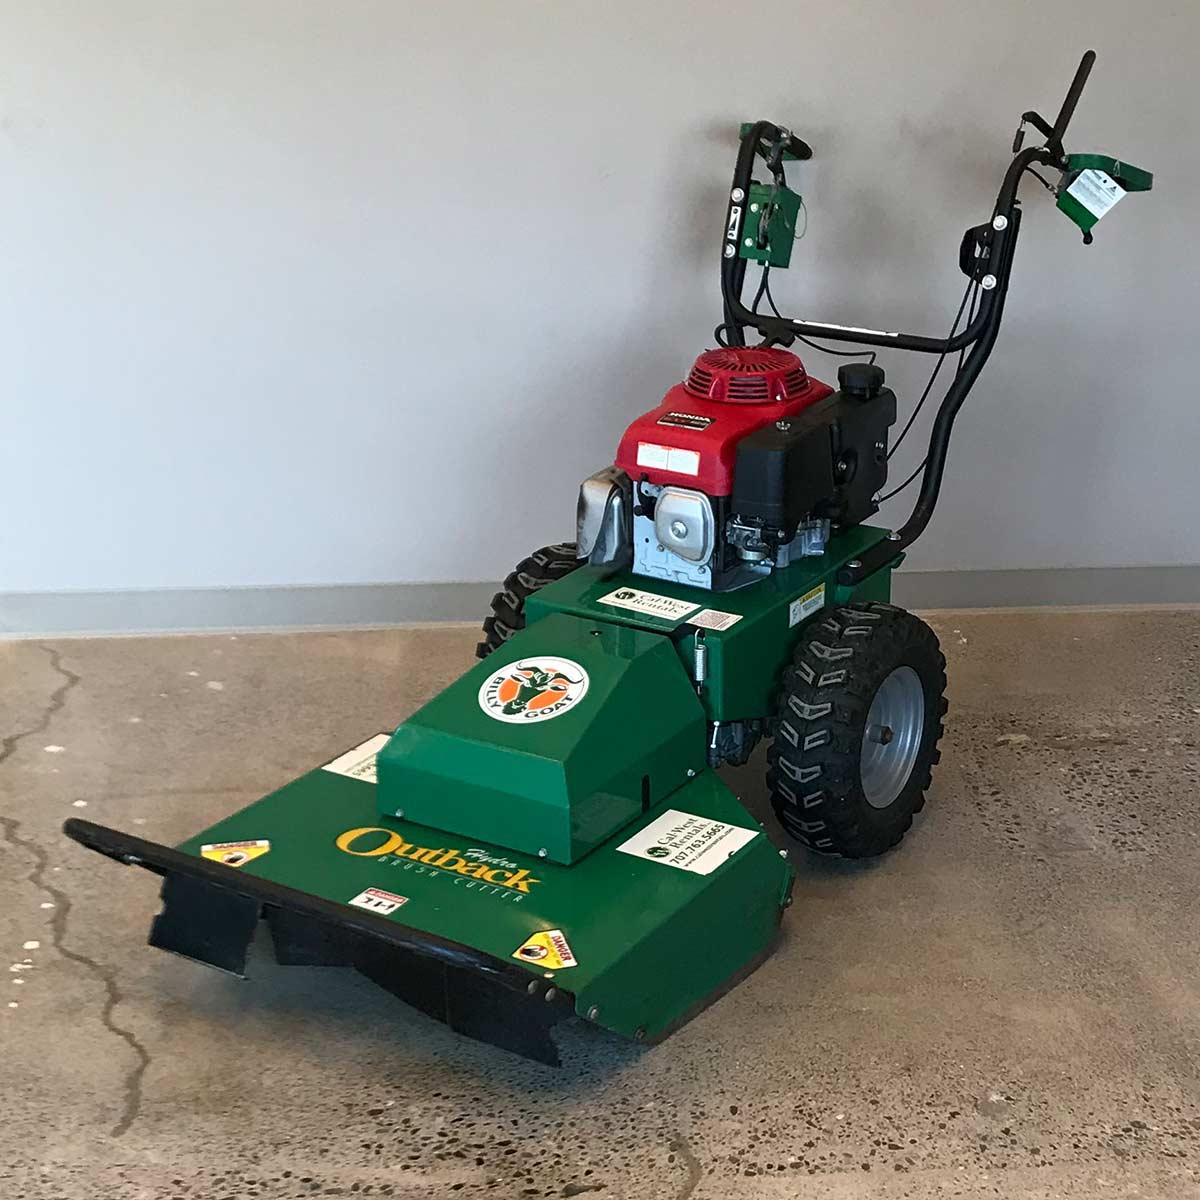 Rental Category Lawn Amp Garden Equipment